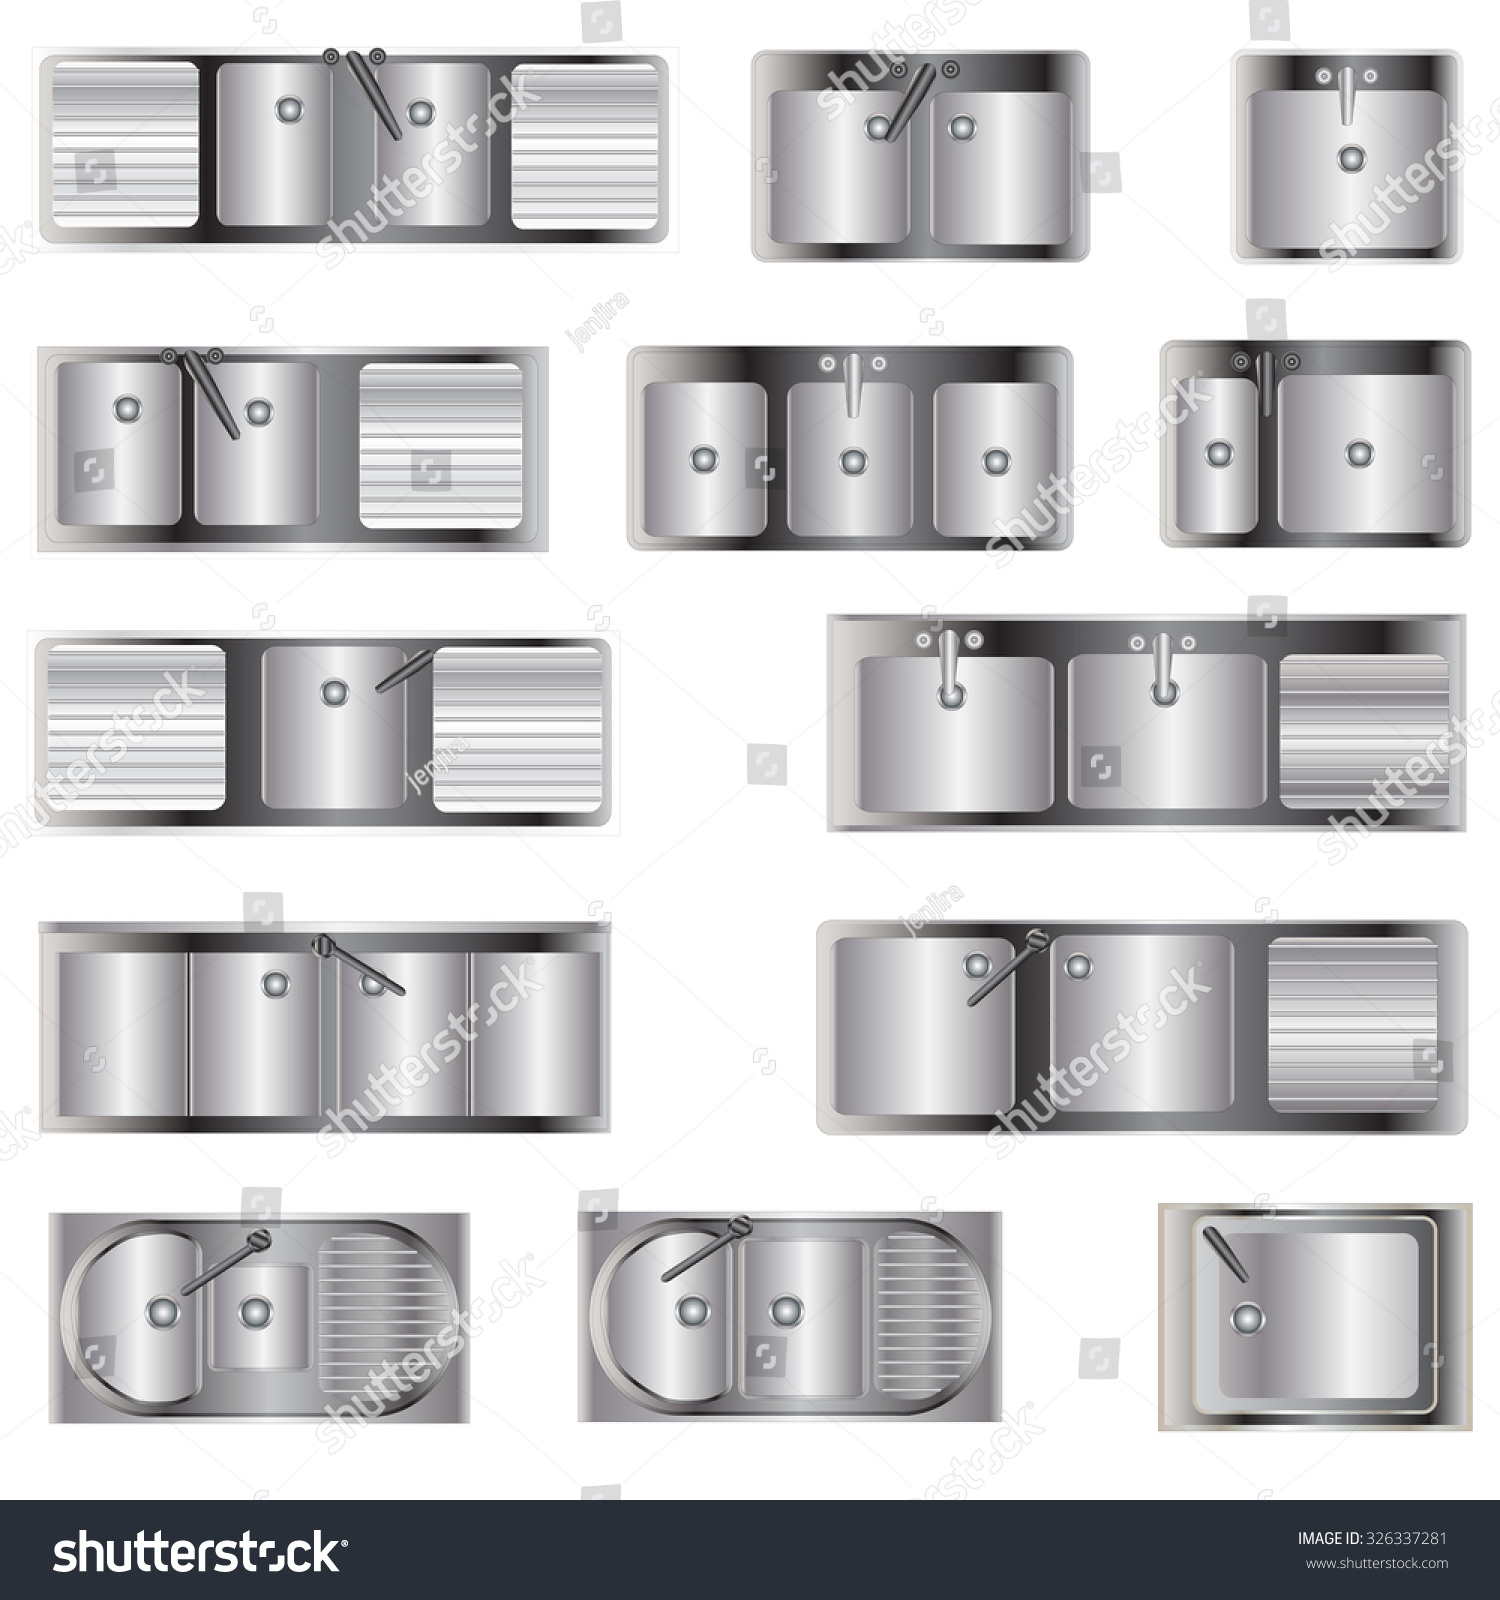 Kitchen Equipment , Sinks Top View Set 2 For Interior